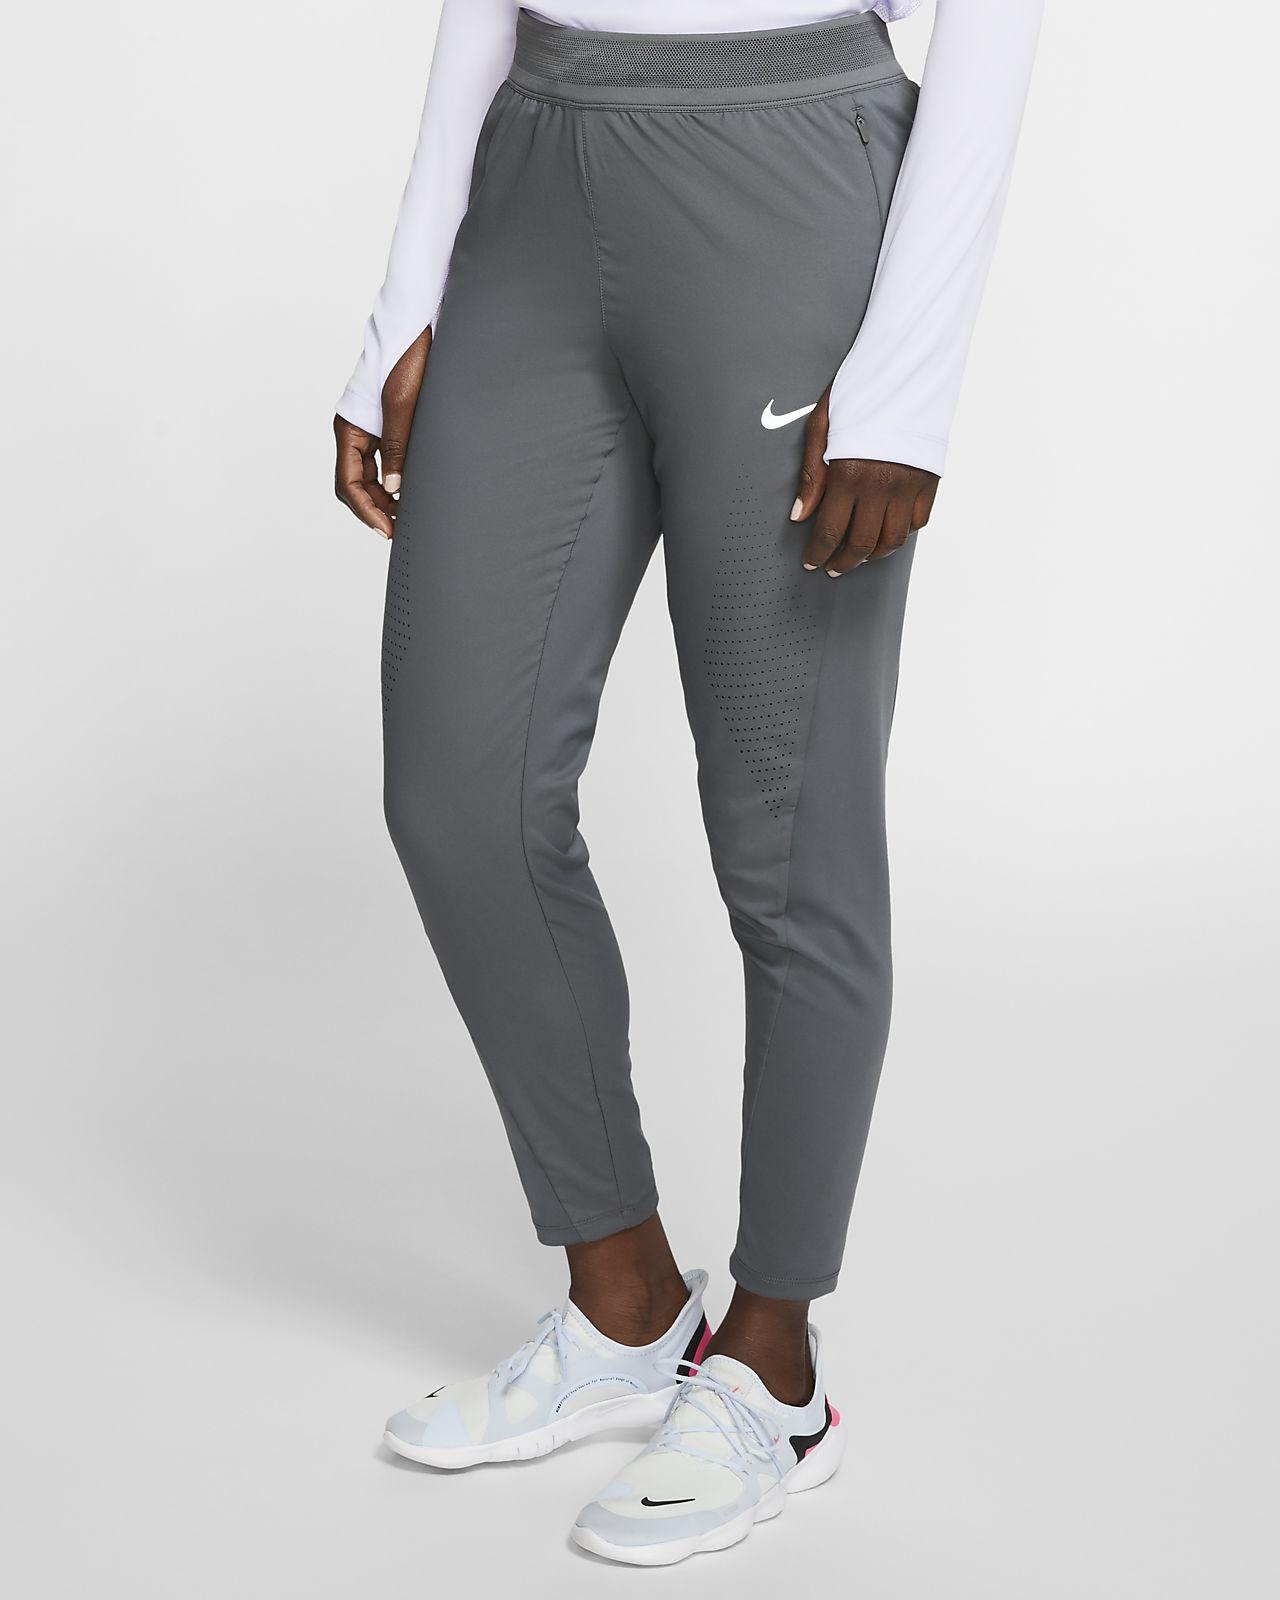 Nike Swift Pantalón de running - Mujer